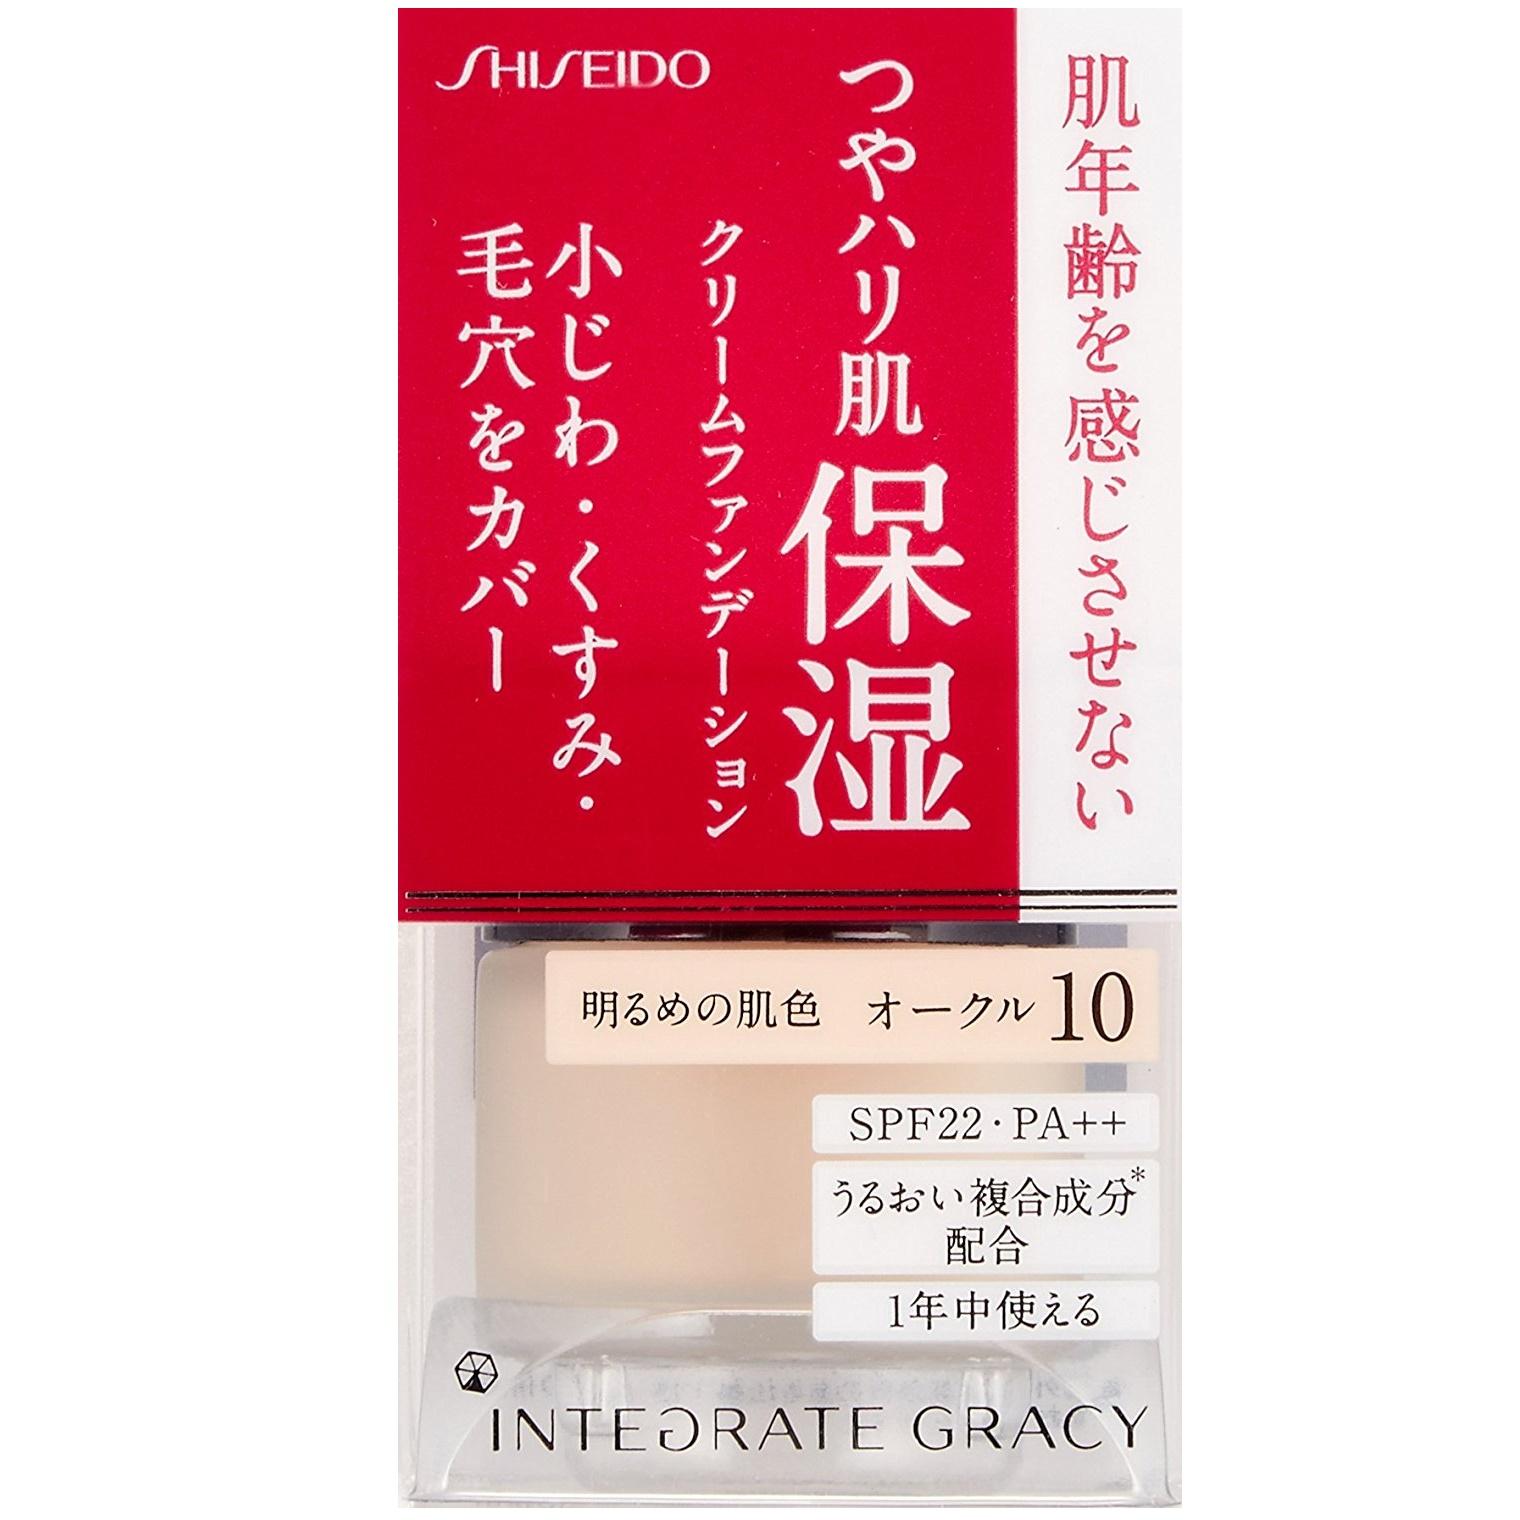 SHISEIDO 资生堂 Integrate Gracy 完美意境保湿粉底霜 25g